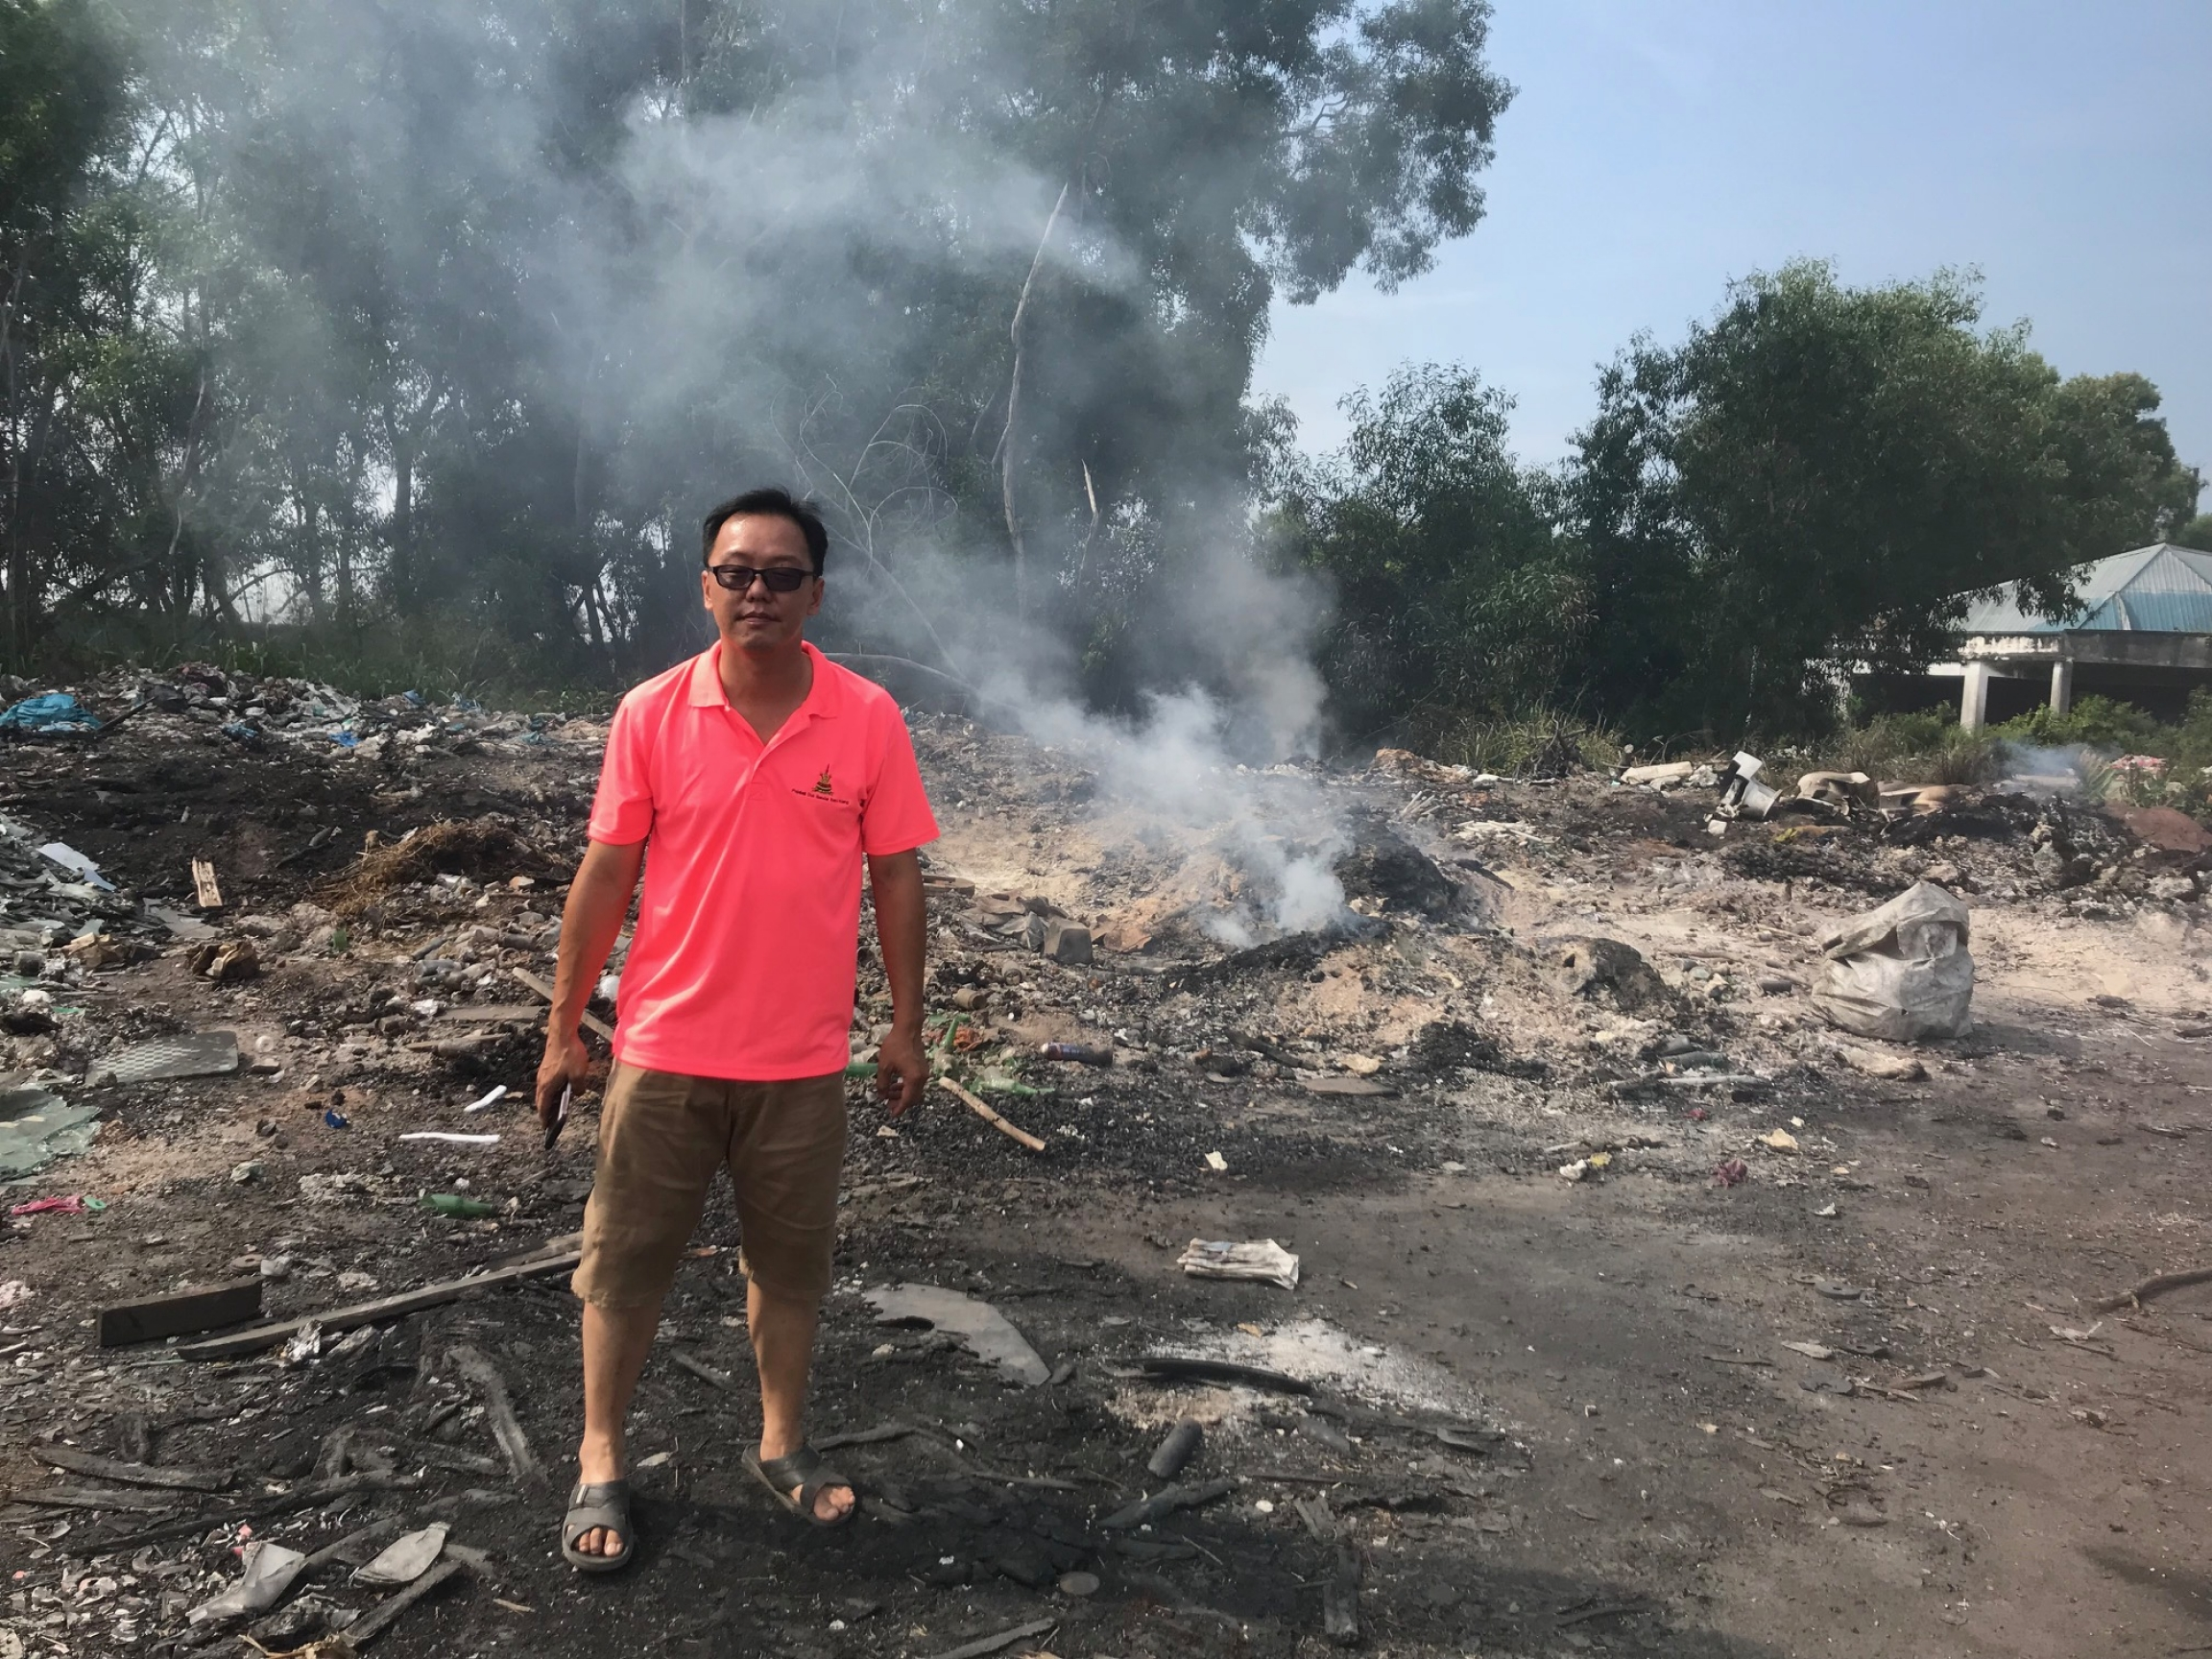 an illegal dump site in Pulau Indah, Malaysia